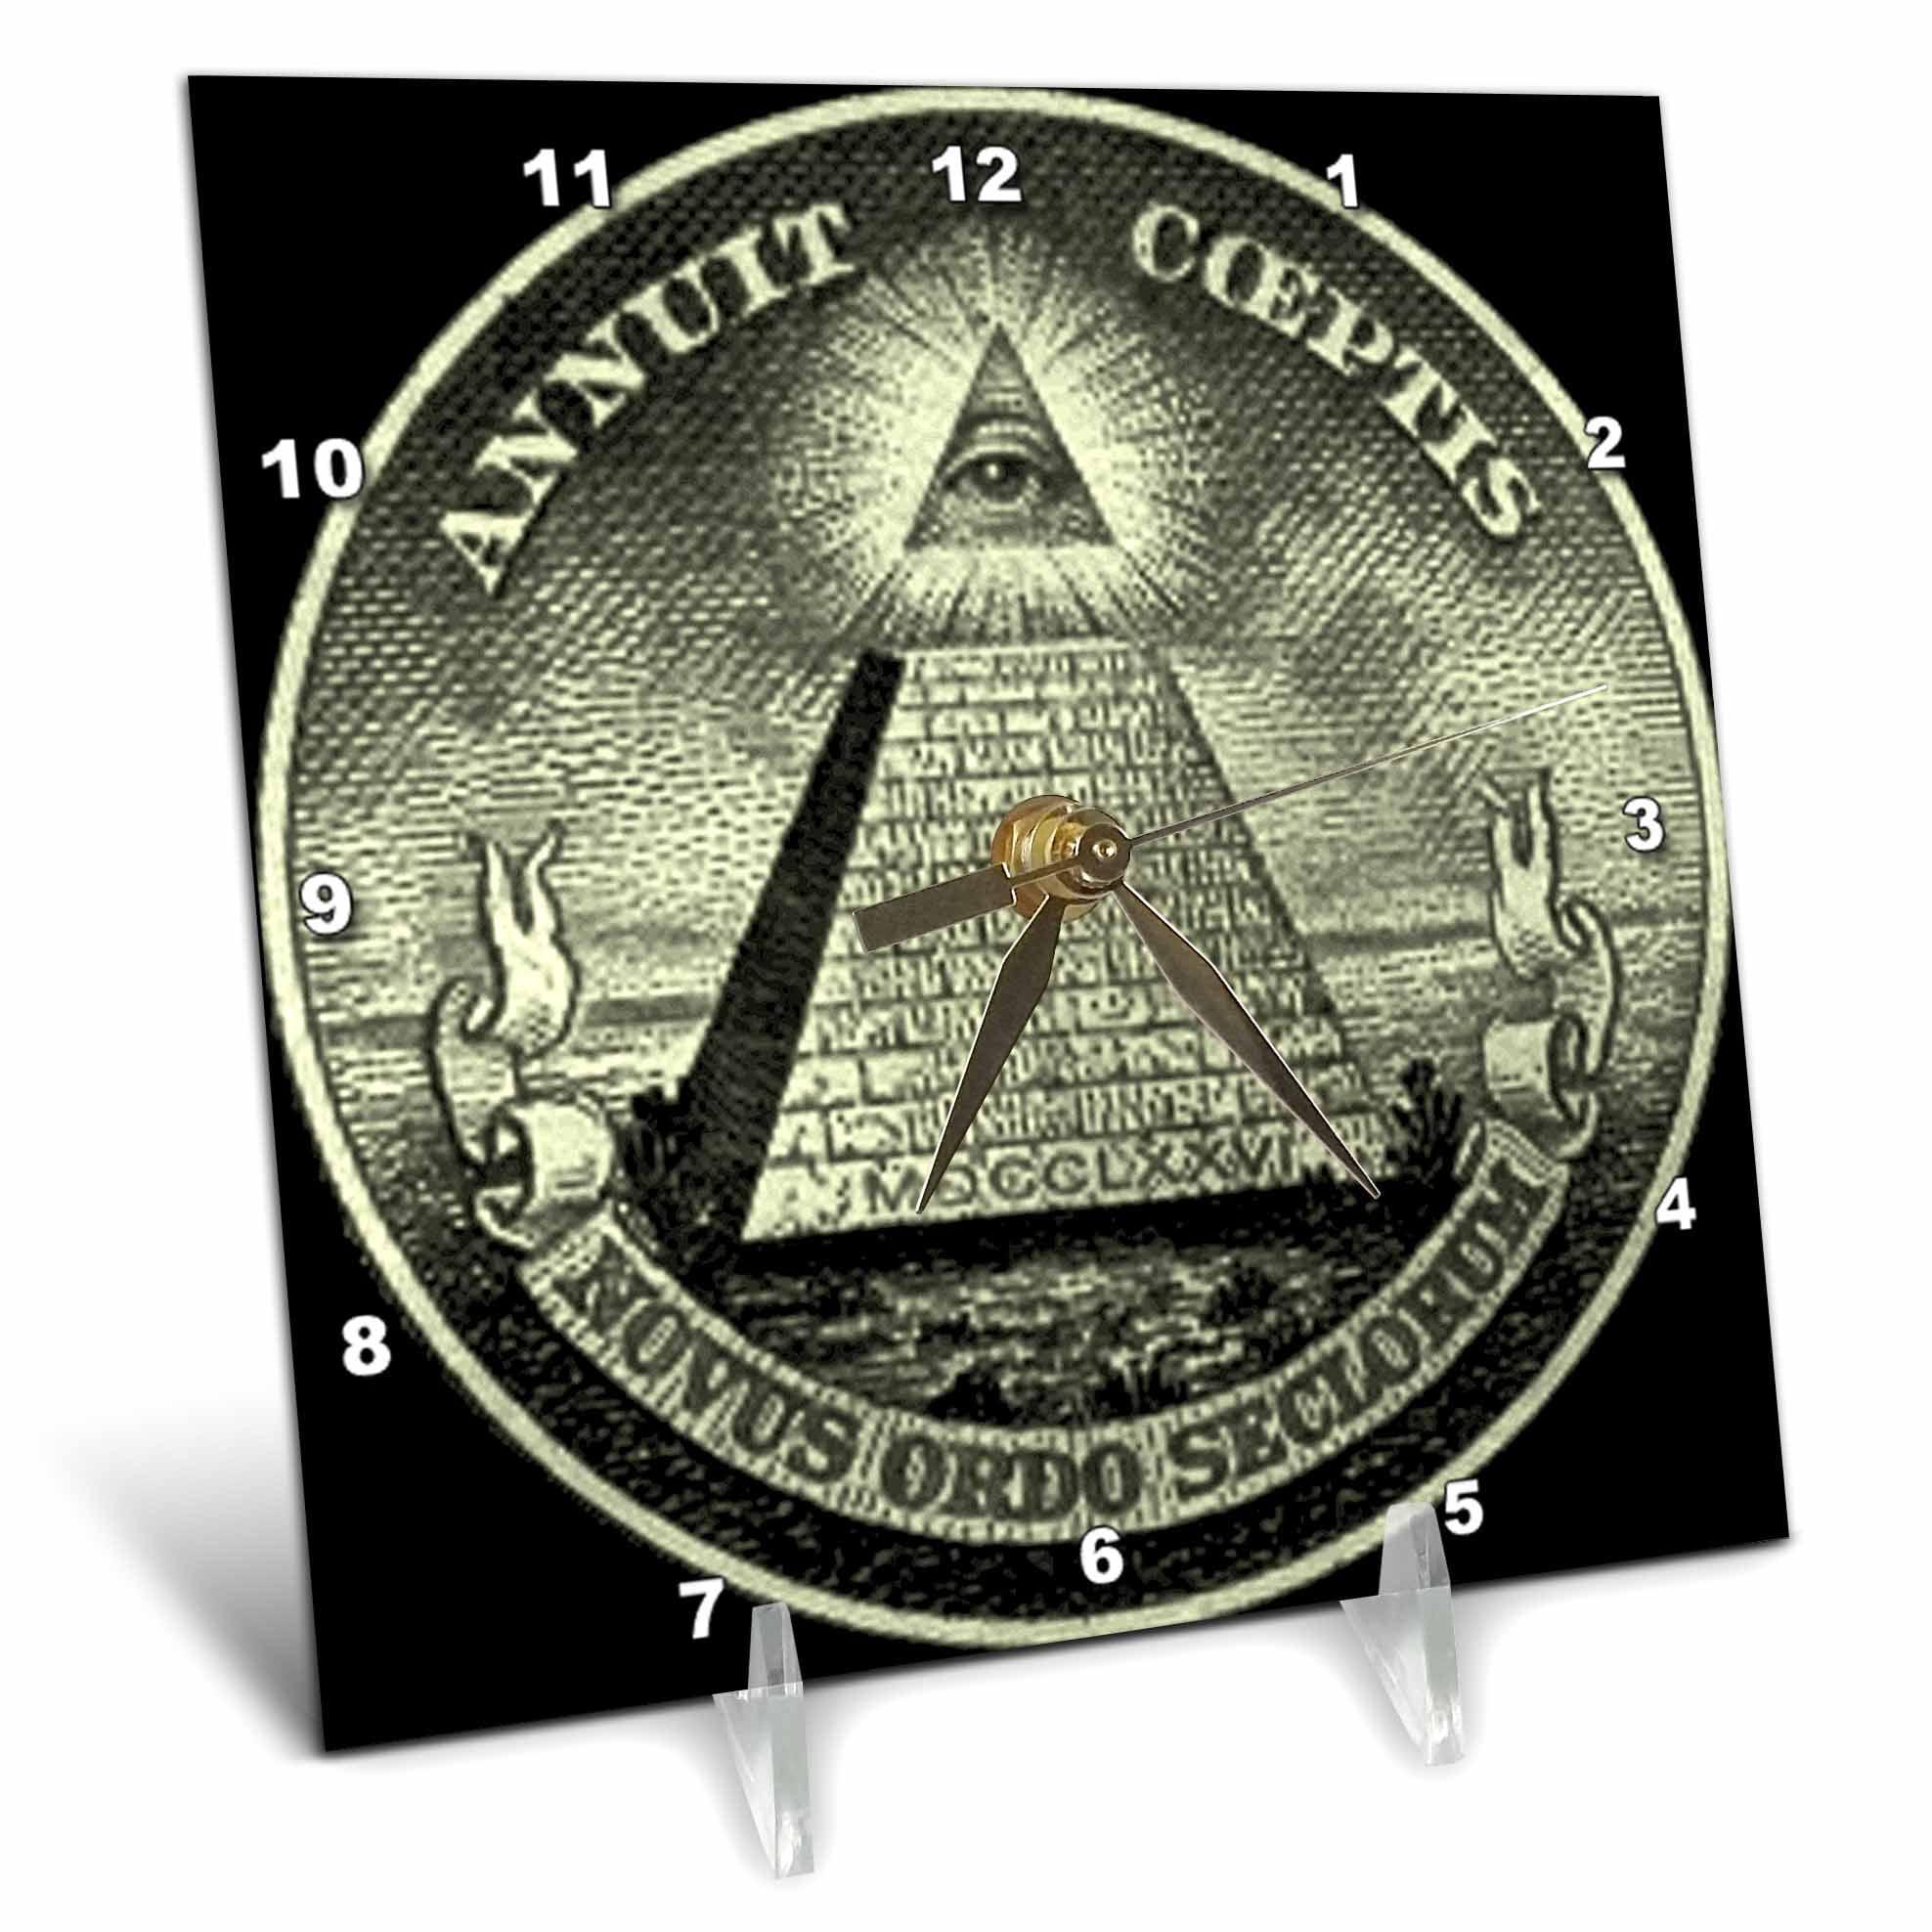 3dRose Illuminati, Desk Clock, 6 by 6-inch by 3dRose